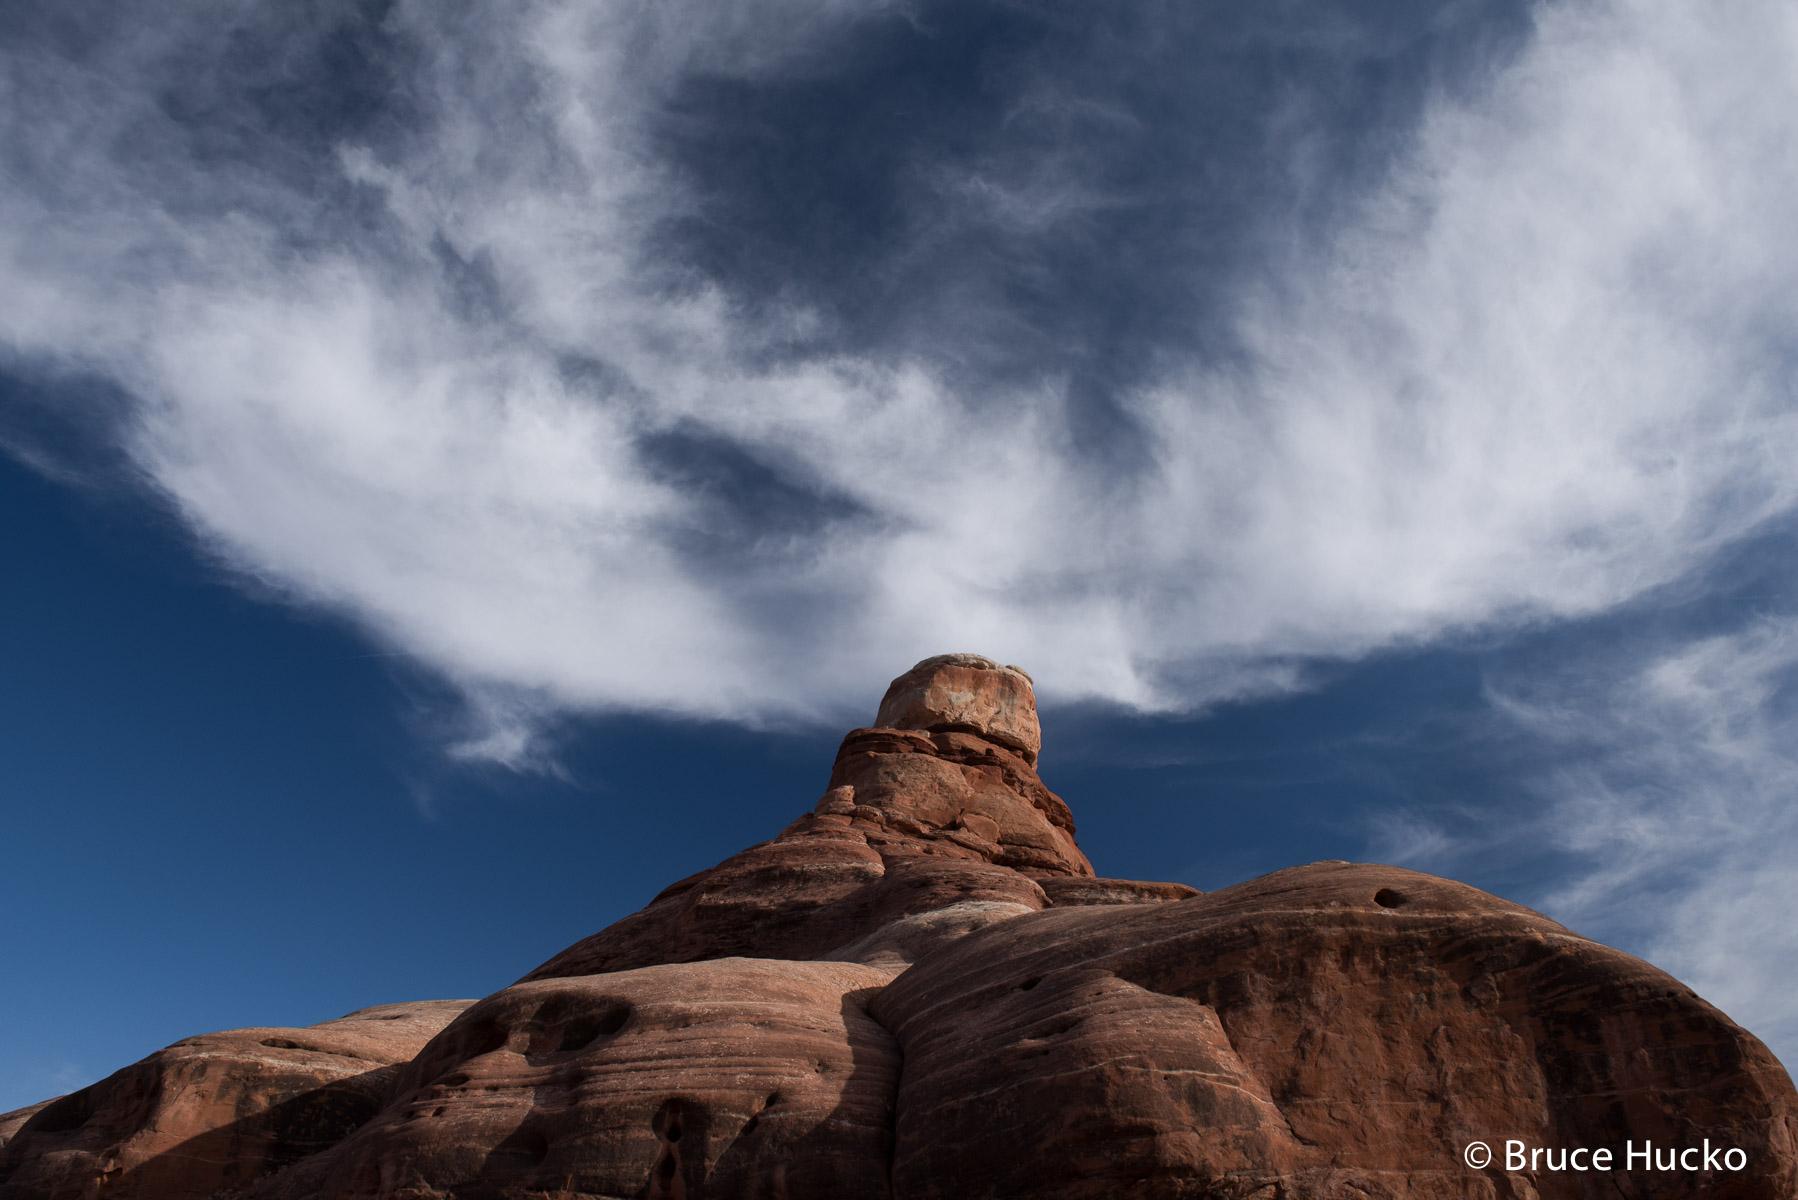 Canyonlands NPS, Canyonlands National Park, Needles, Needles District